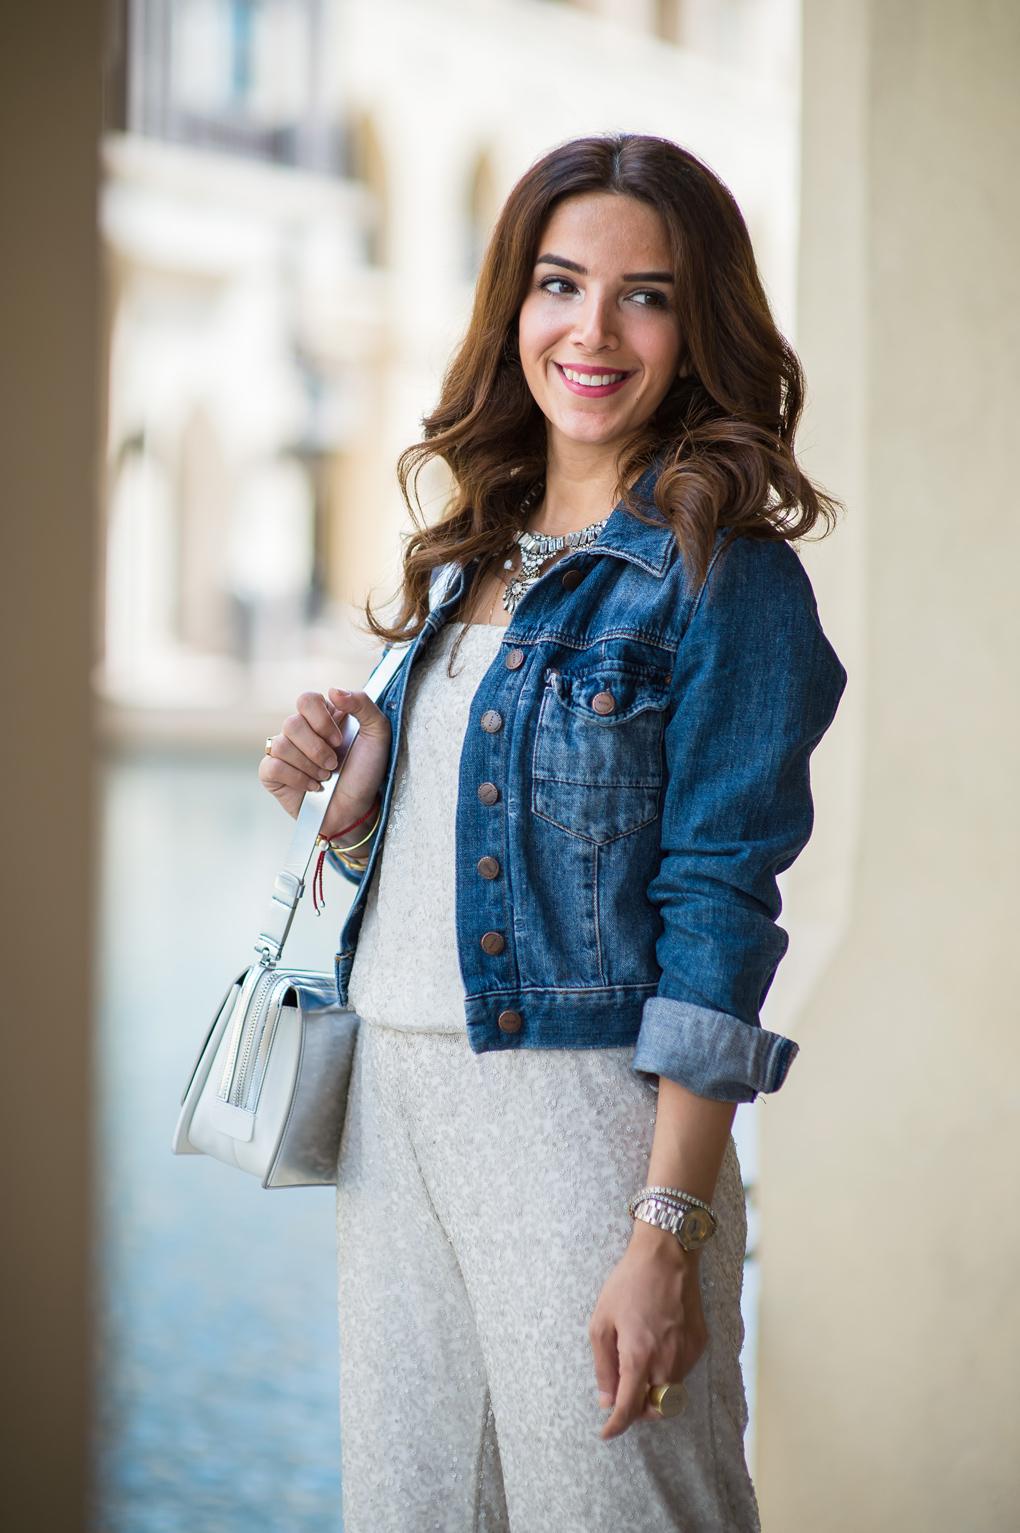 Lyla_Loves_Fashion_Michelle_Belau_Roger_Vivier_Bag_029